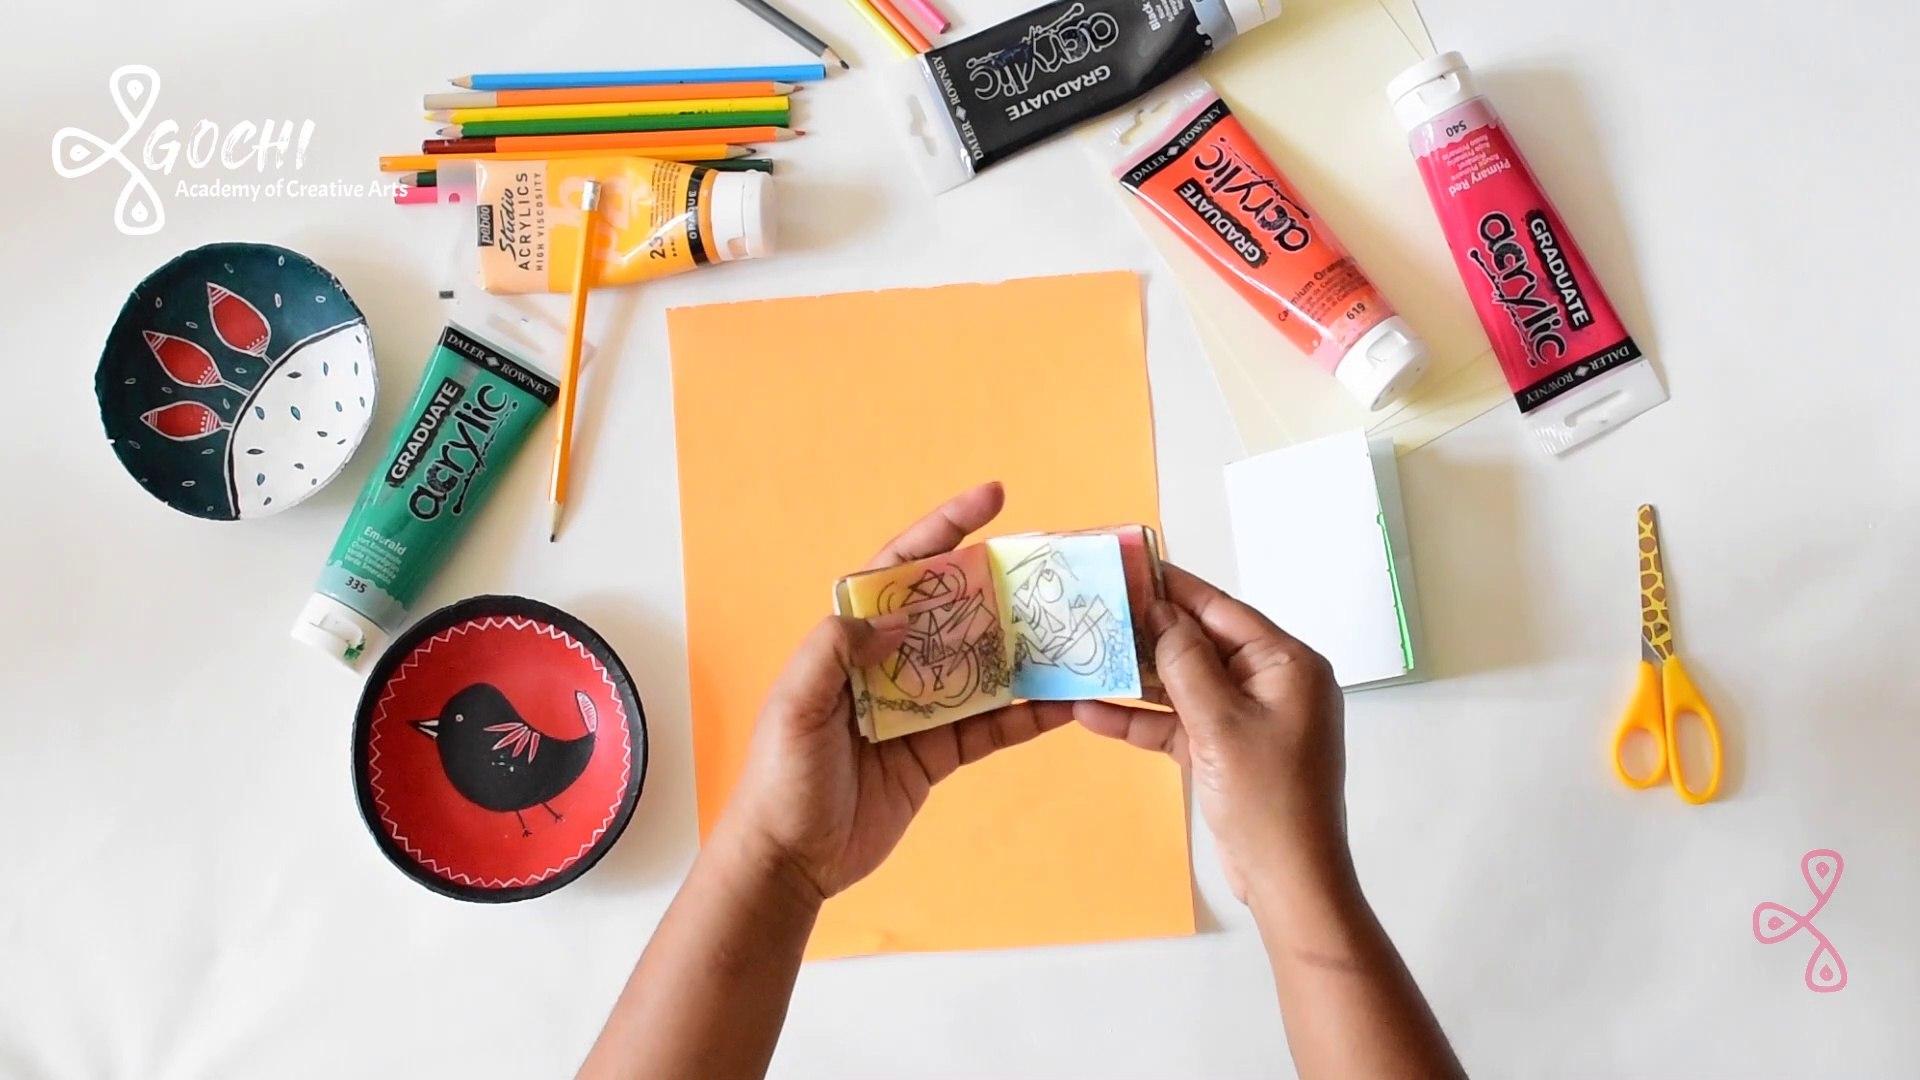 Easy Creative Activity for Kids - Mini Sketchbook